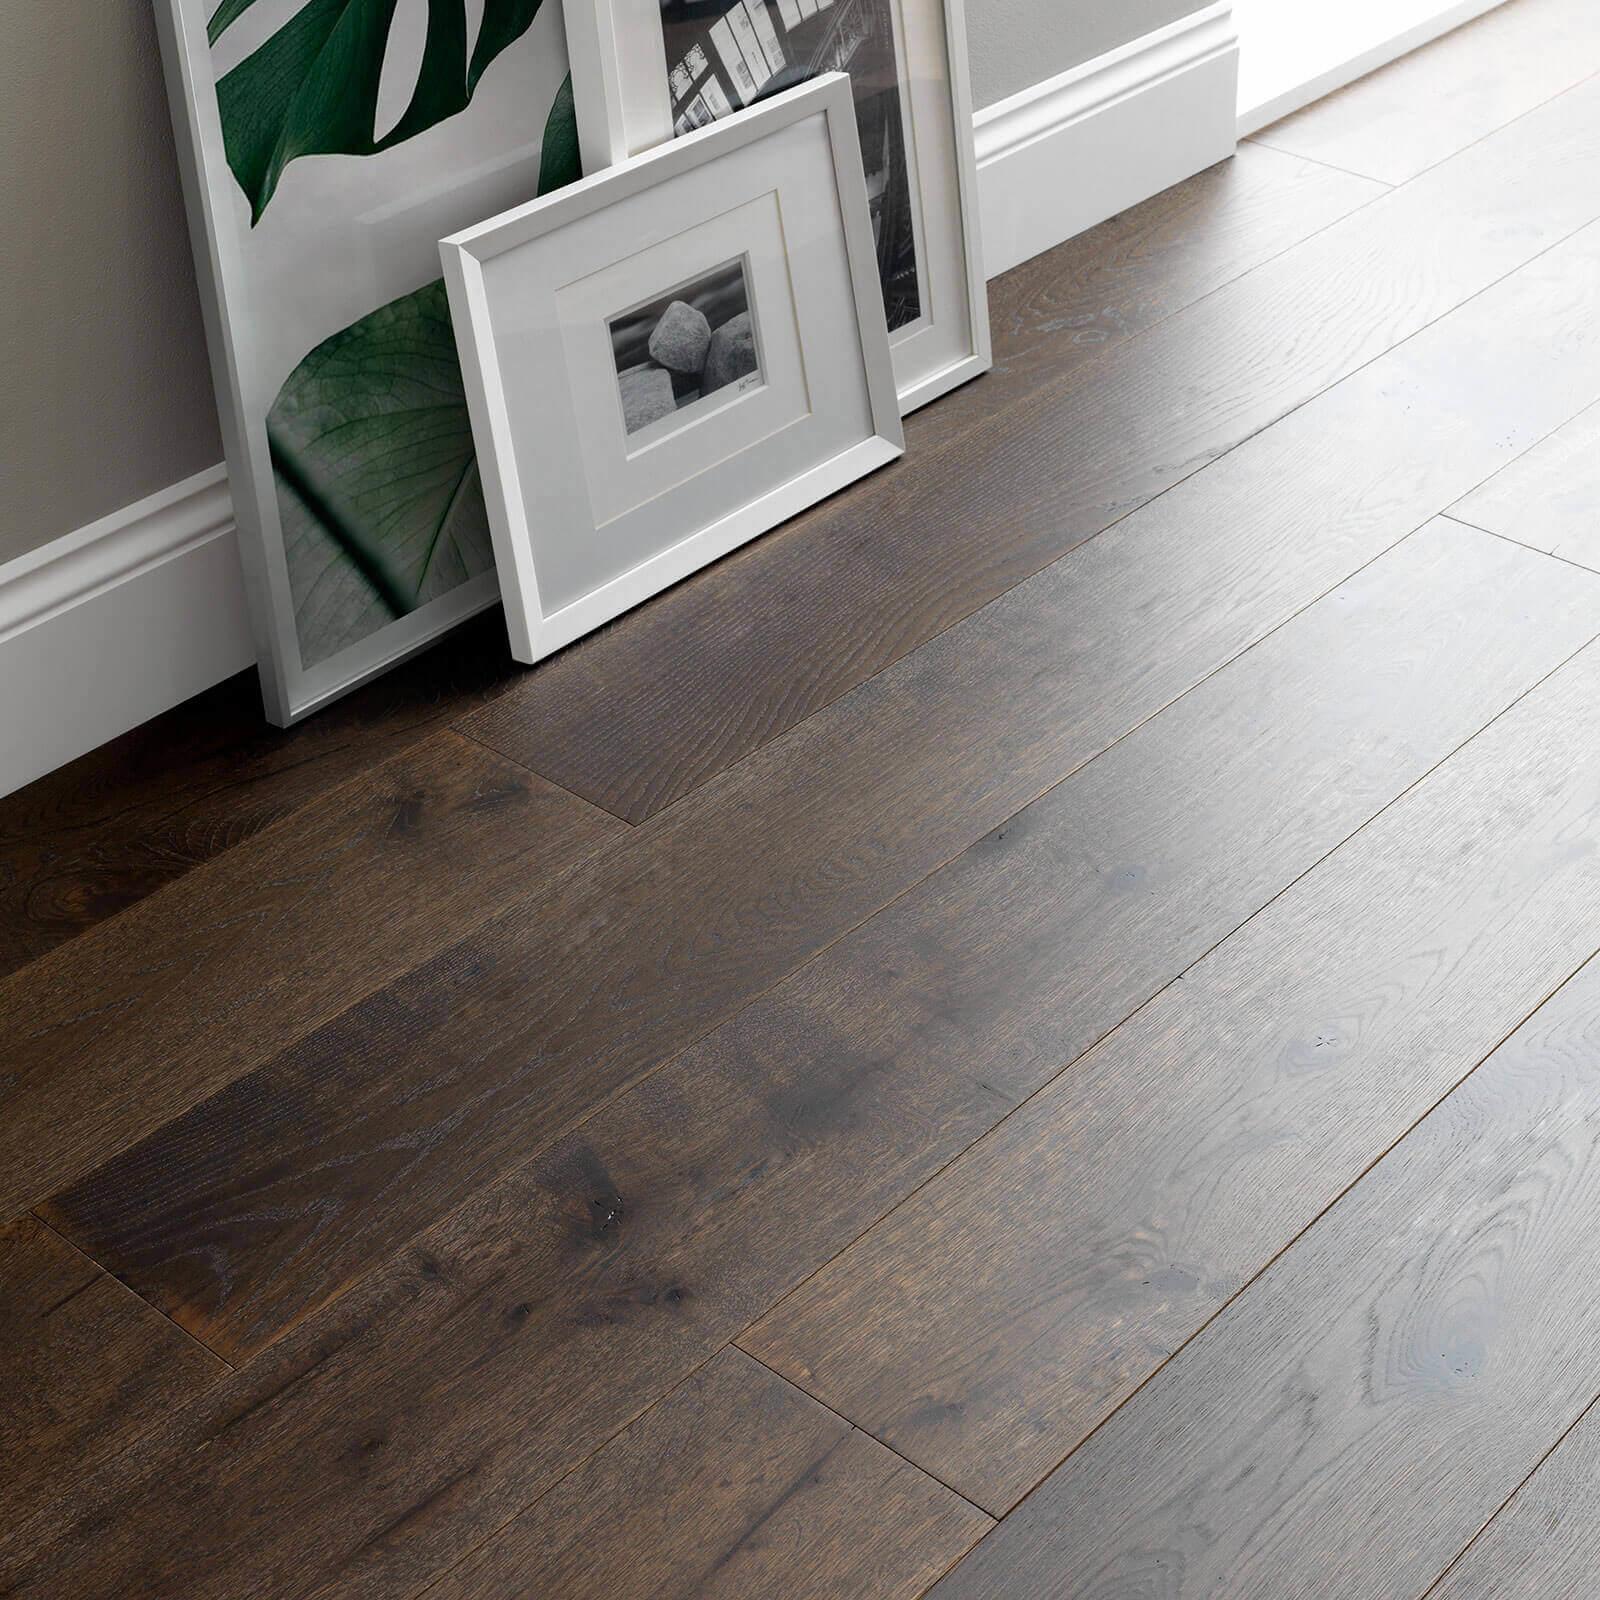 Planed Cocoa Oak UV Hardwax Oil Chepstow Woodpecker Flooring Lifestyle